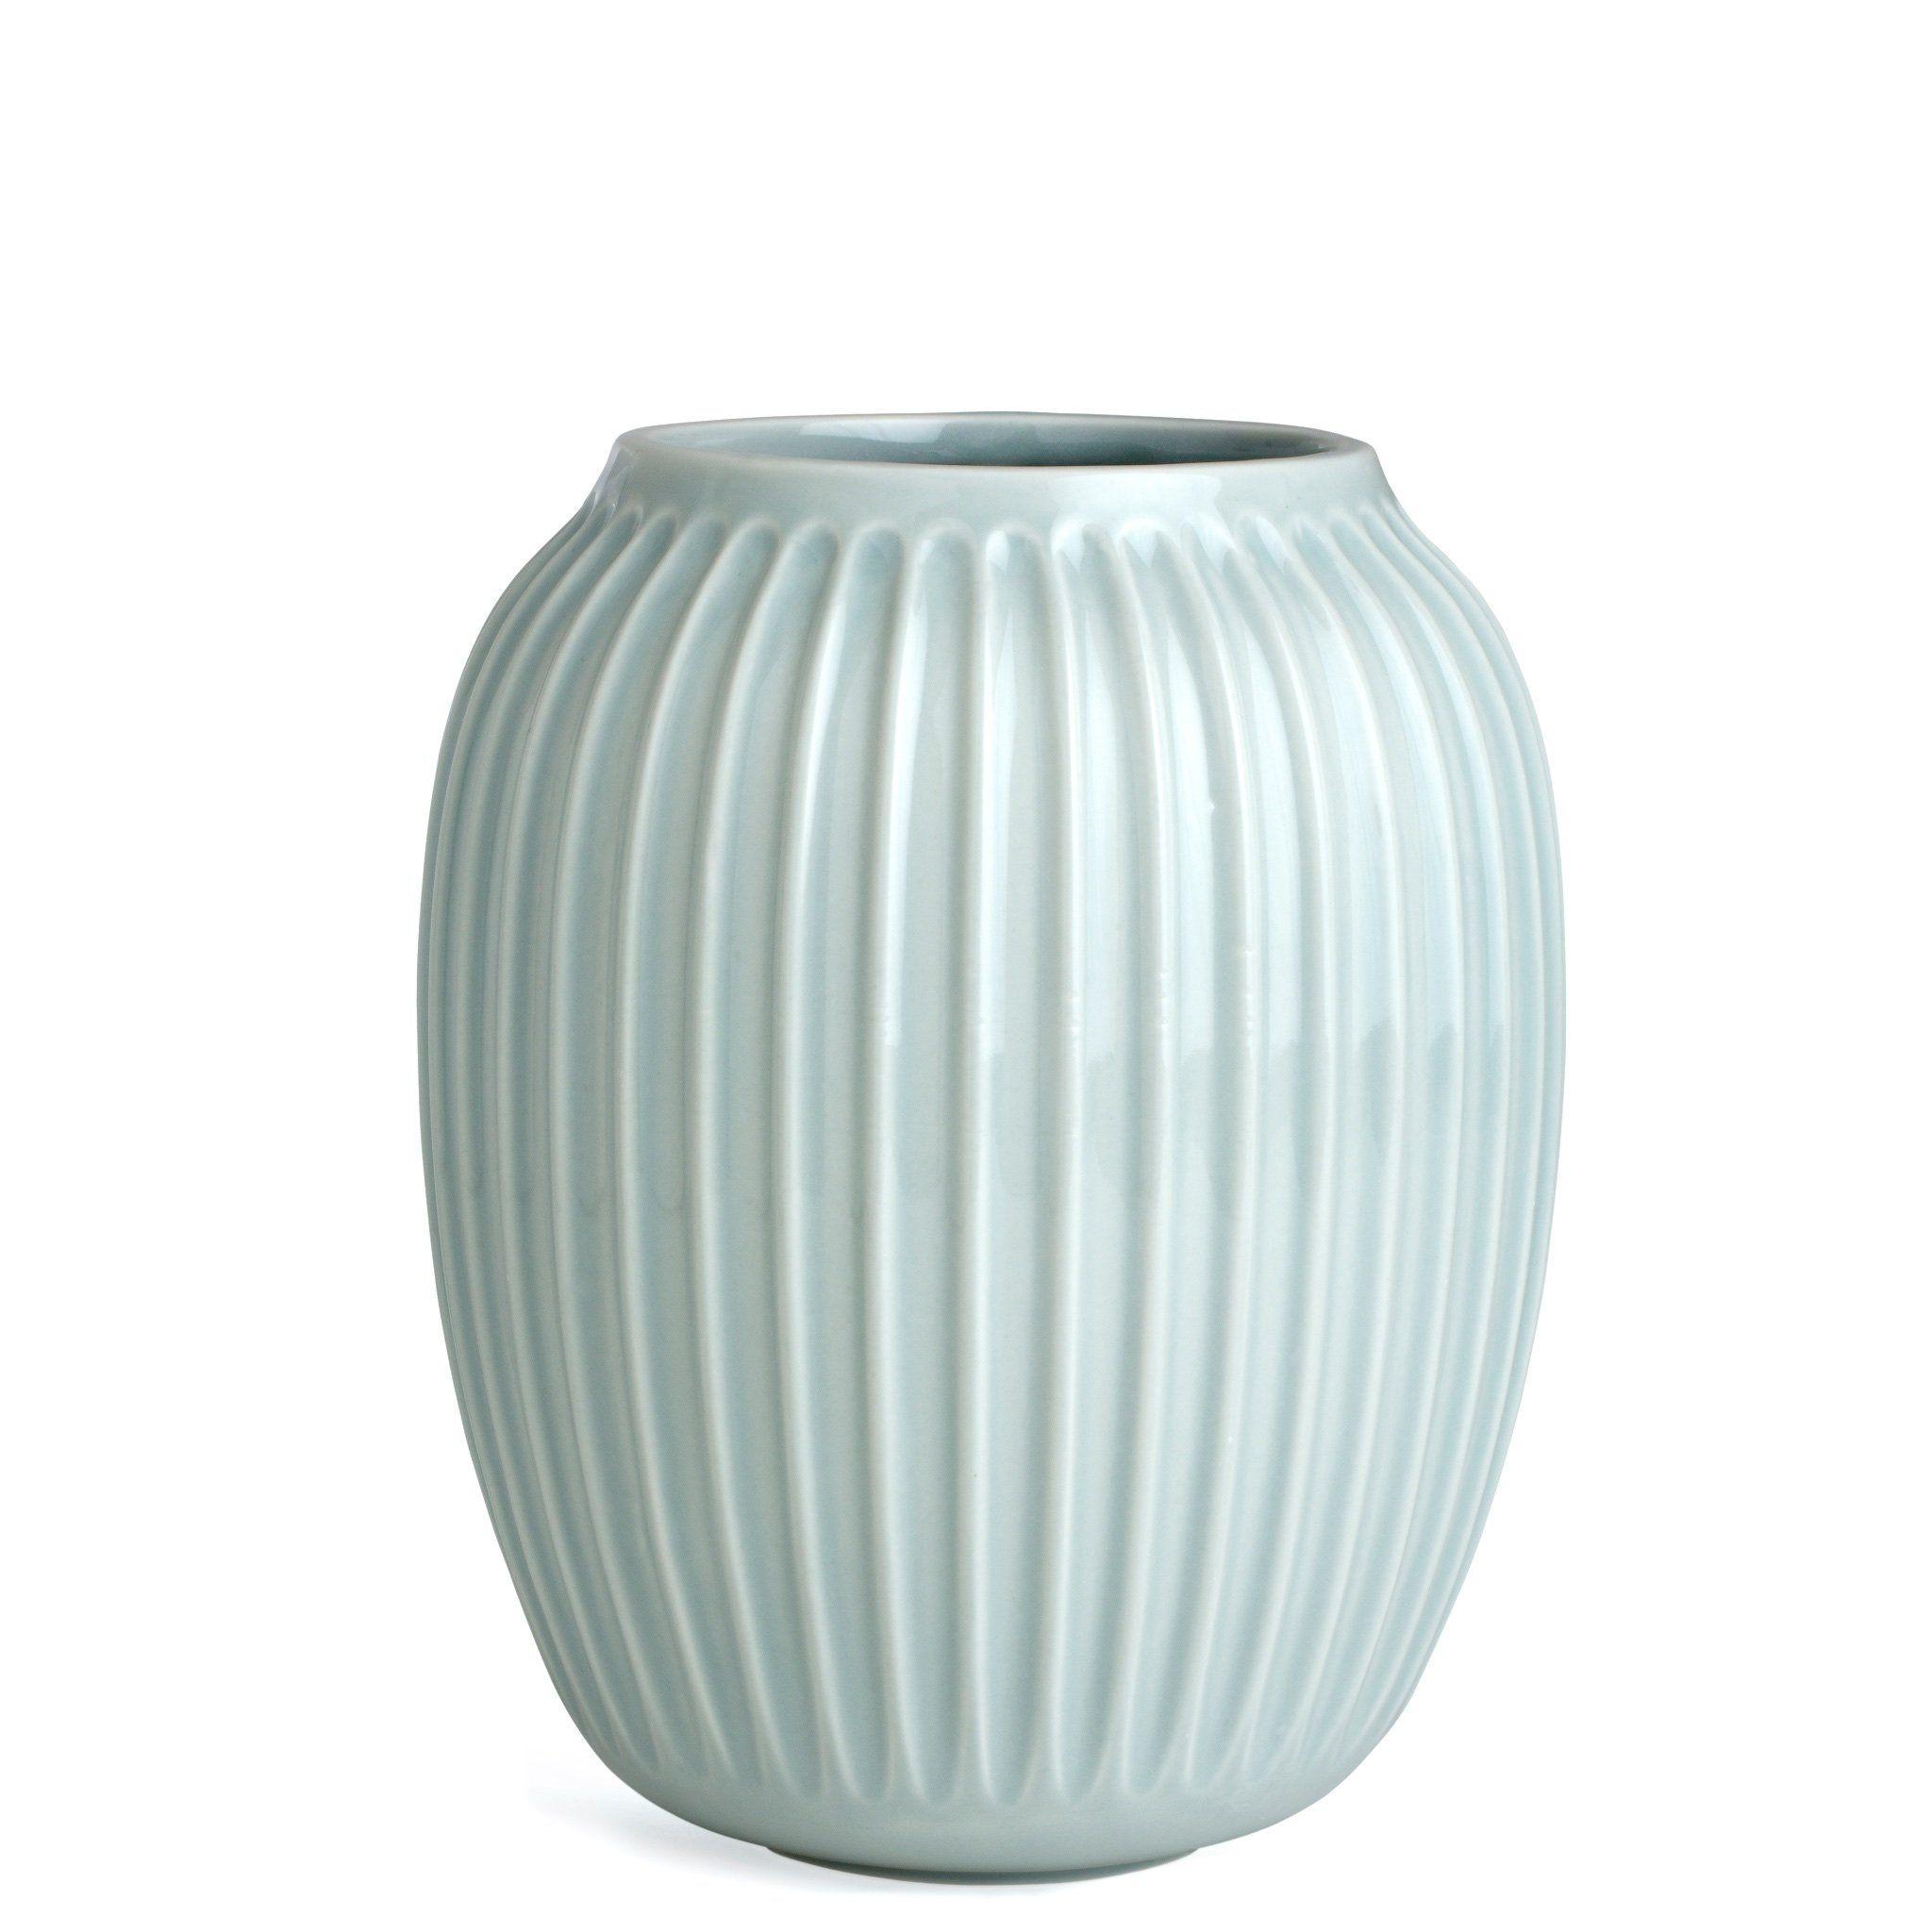 Kahler Hammershoi Medium Large Scandinavian Design Ceramic Vase Mint Light Green Medium Large Sized Contemporary Sc Large Ceramic Vase Ceramic Vase Vase